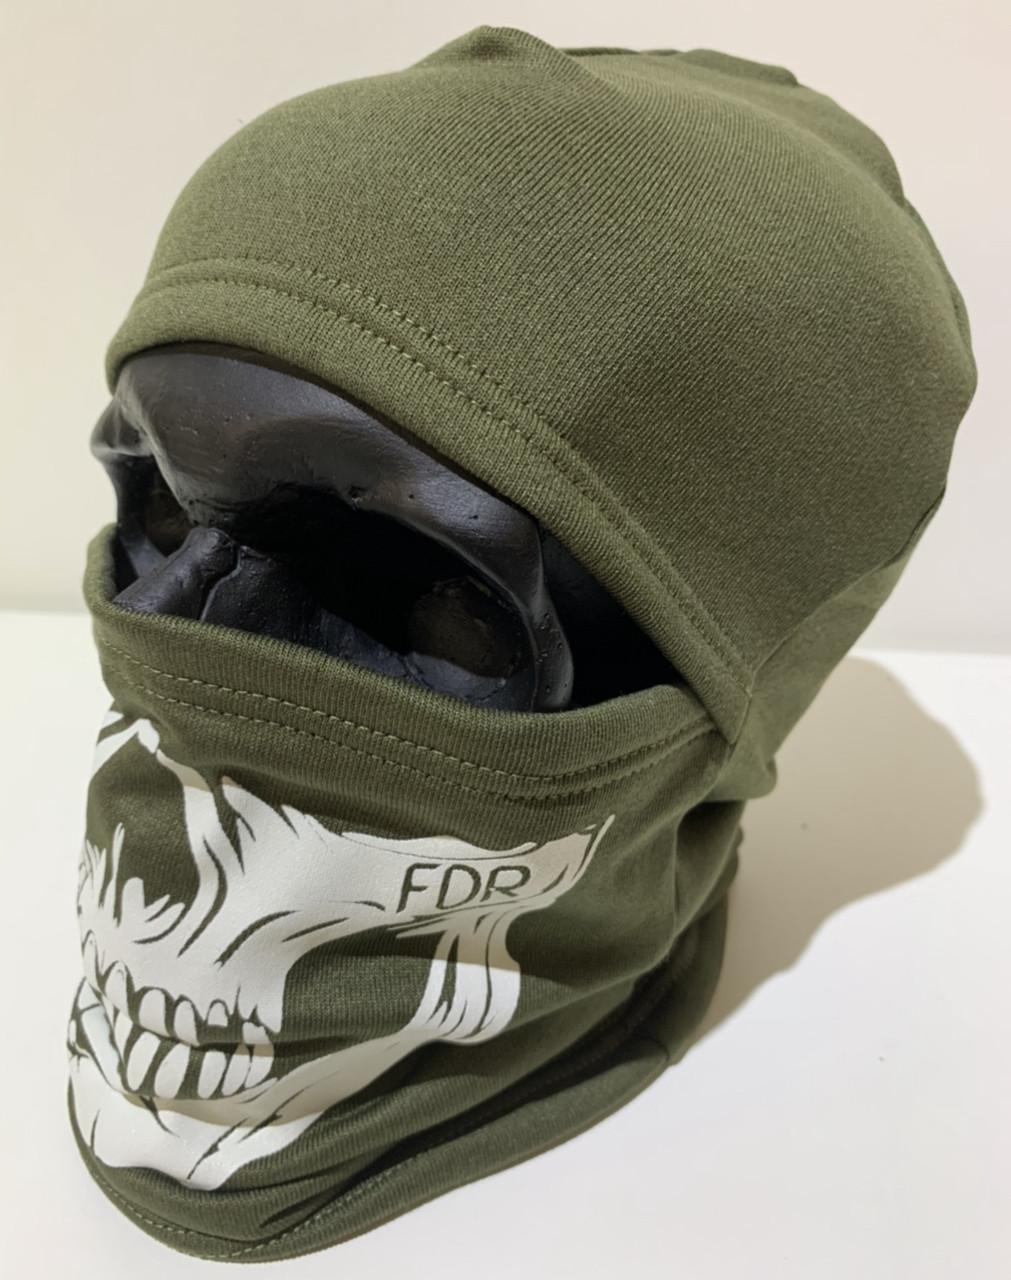 Балаклава череп (Skull) FDR хаки